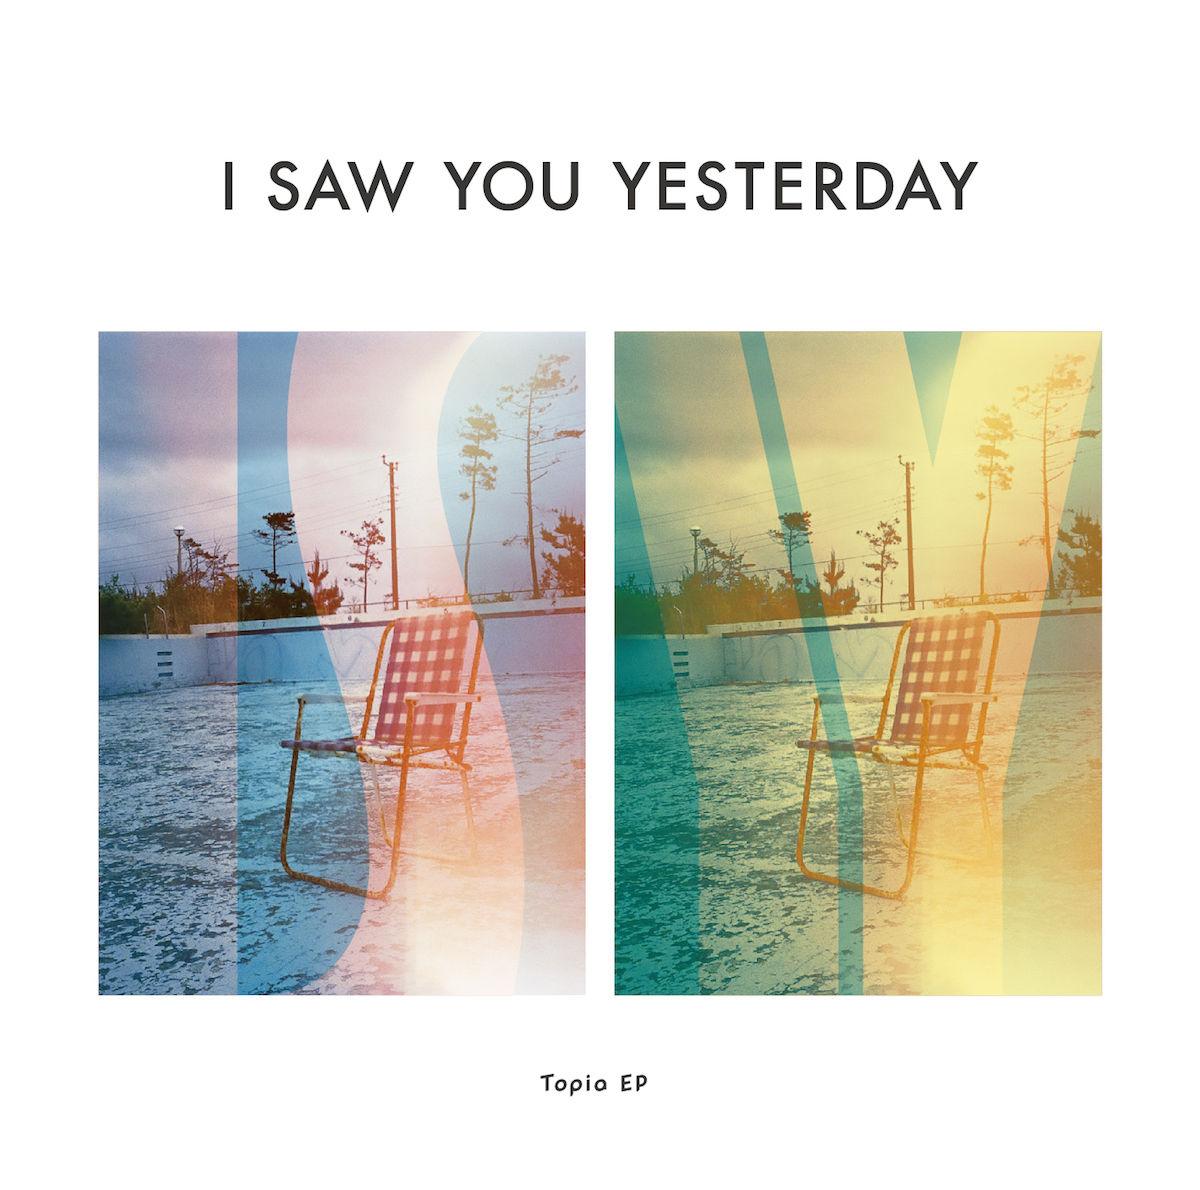 I Saw You Yesterdayが時代に溶け込む理由|注目のインディー・ポップバンドに初インタビュー ISYY-1-1200x1190